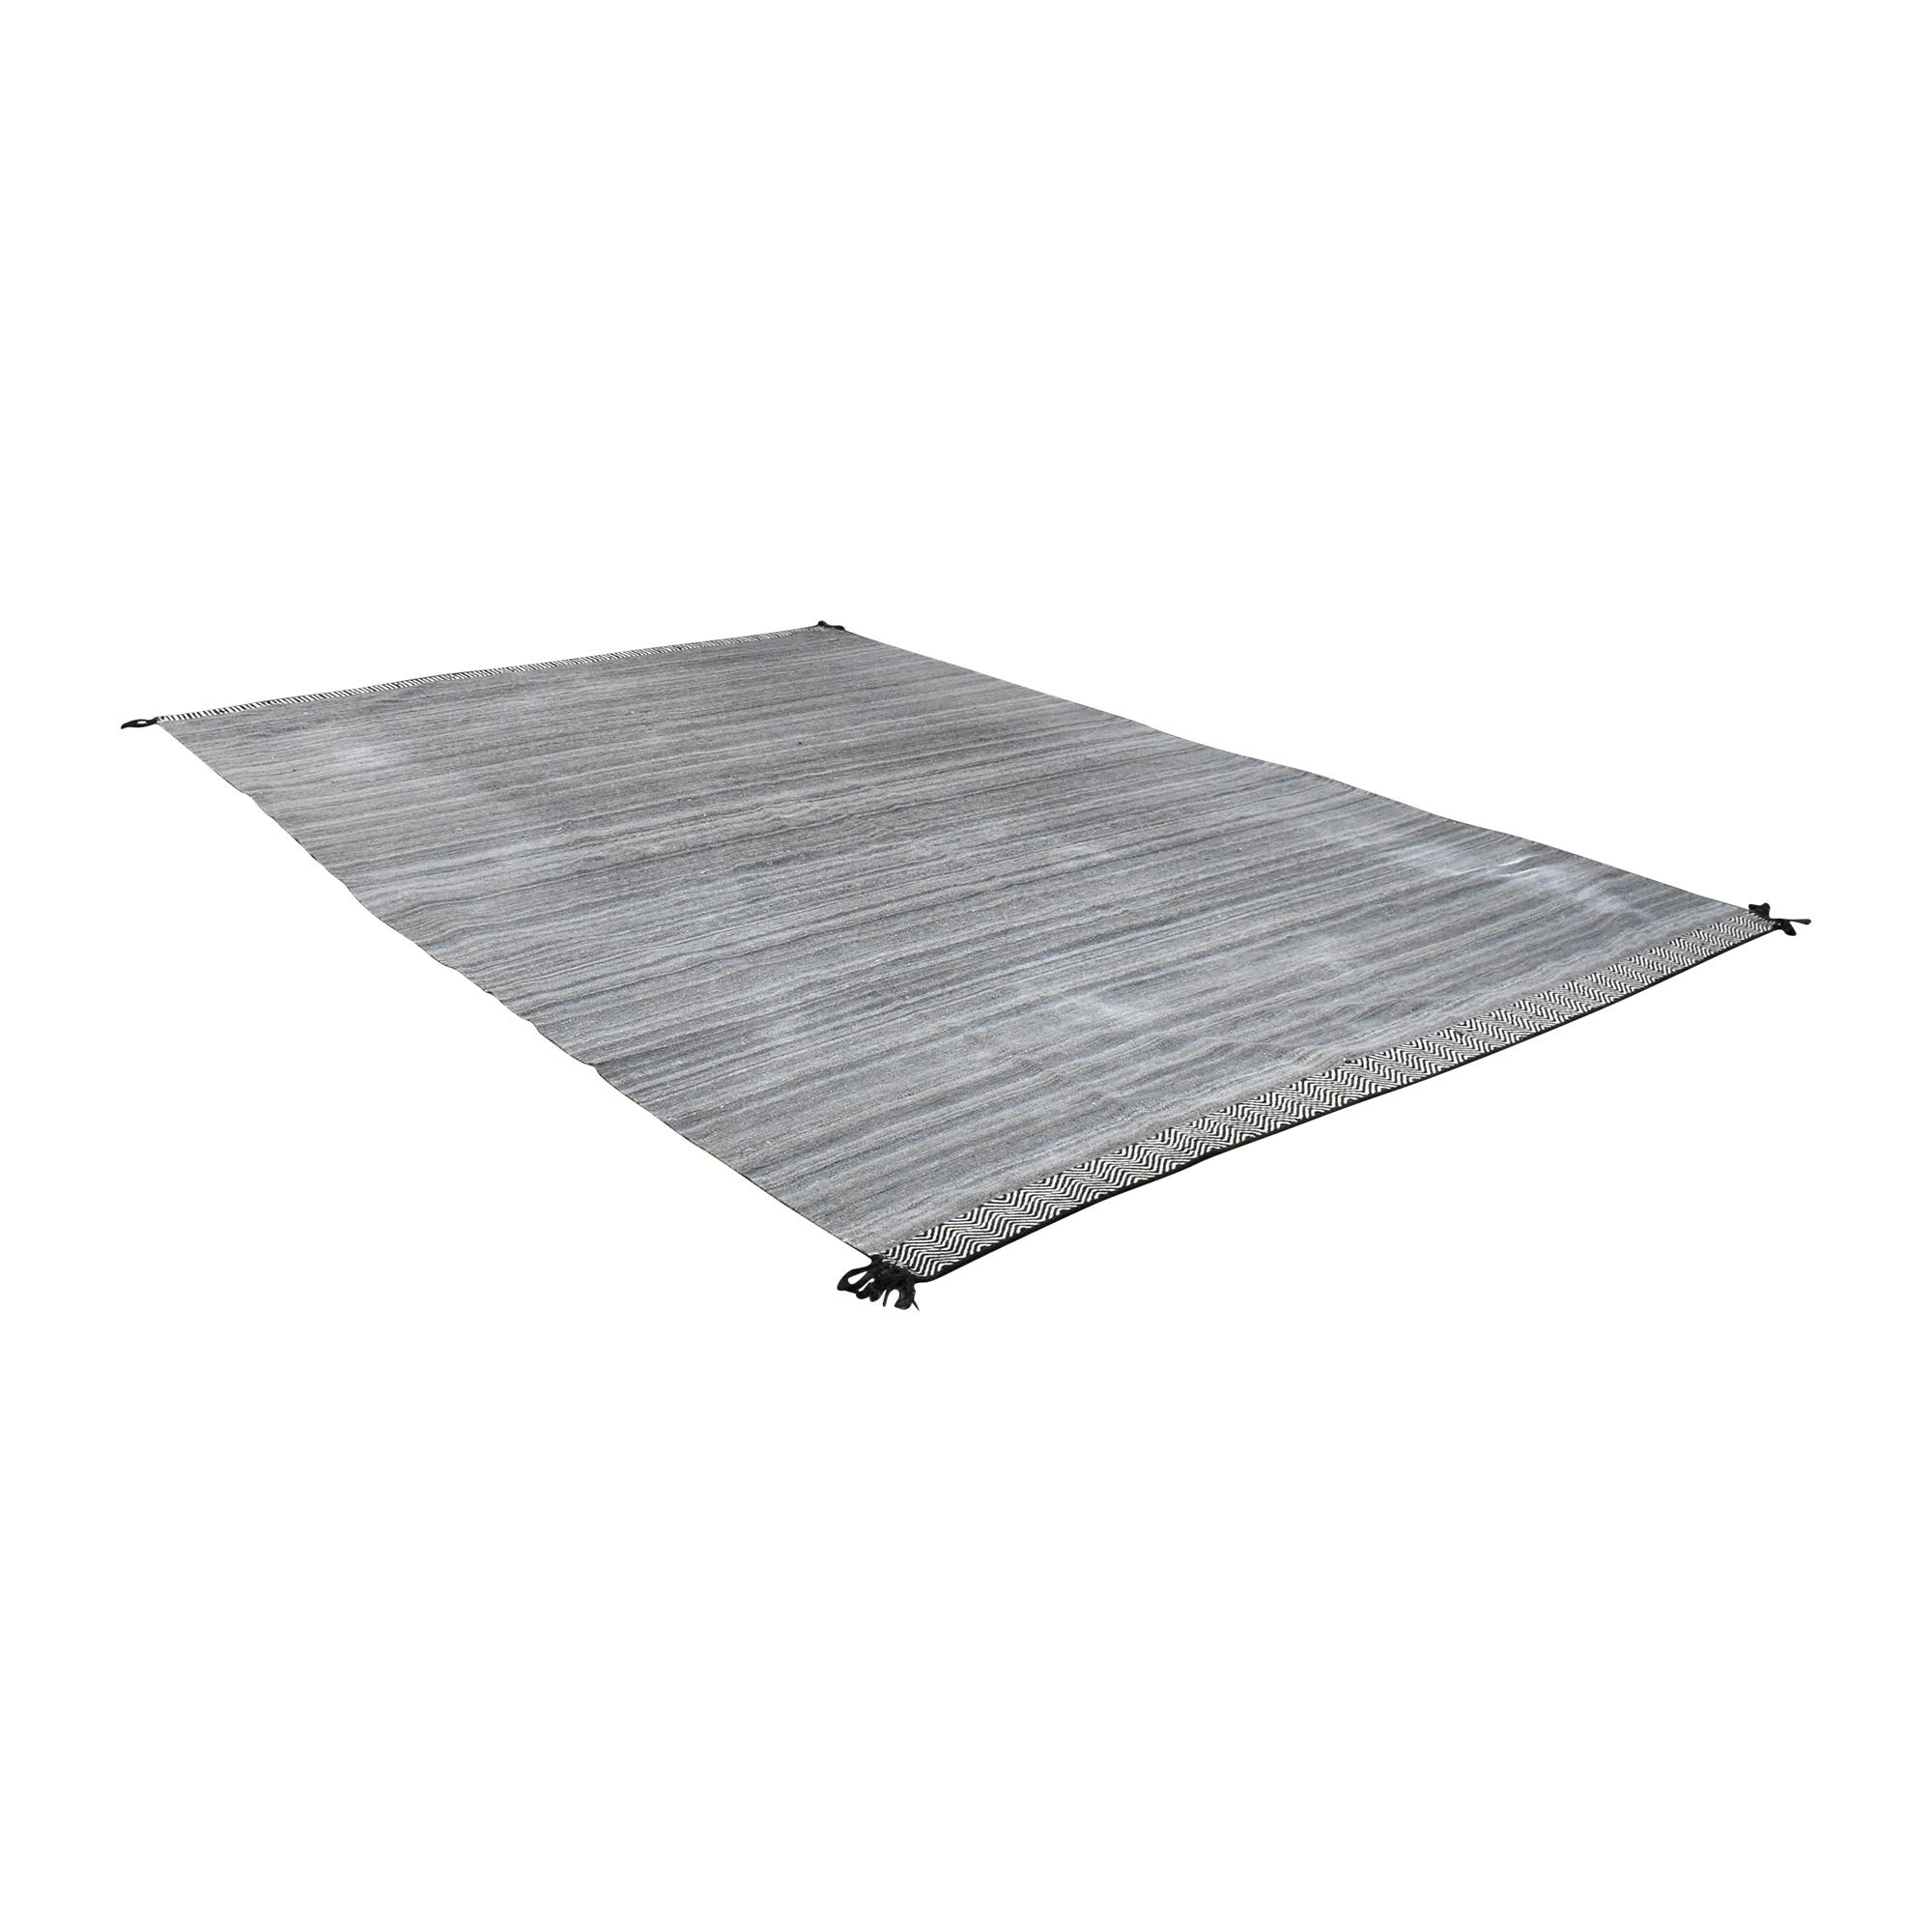 ABC Carpet & Home Flat Weave Area Rug sale